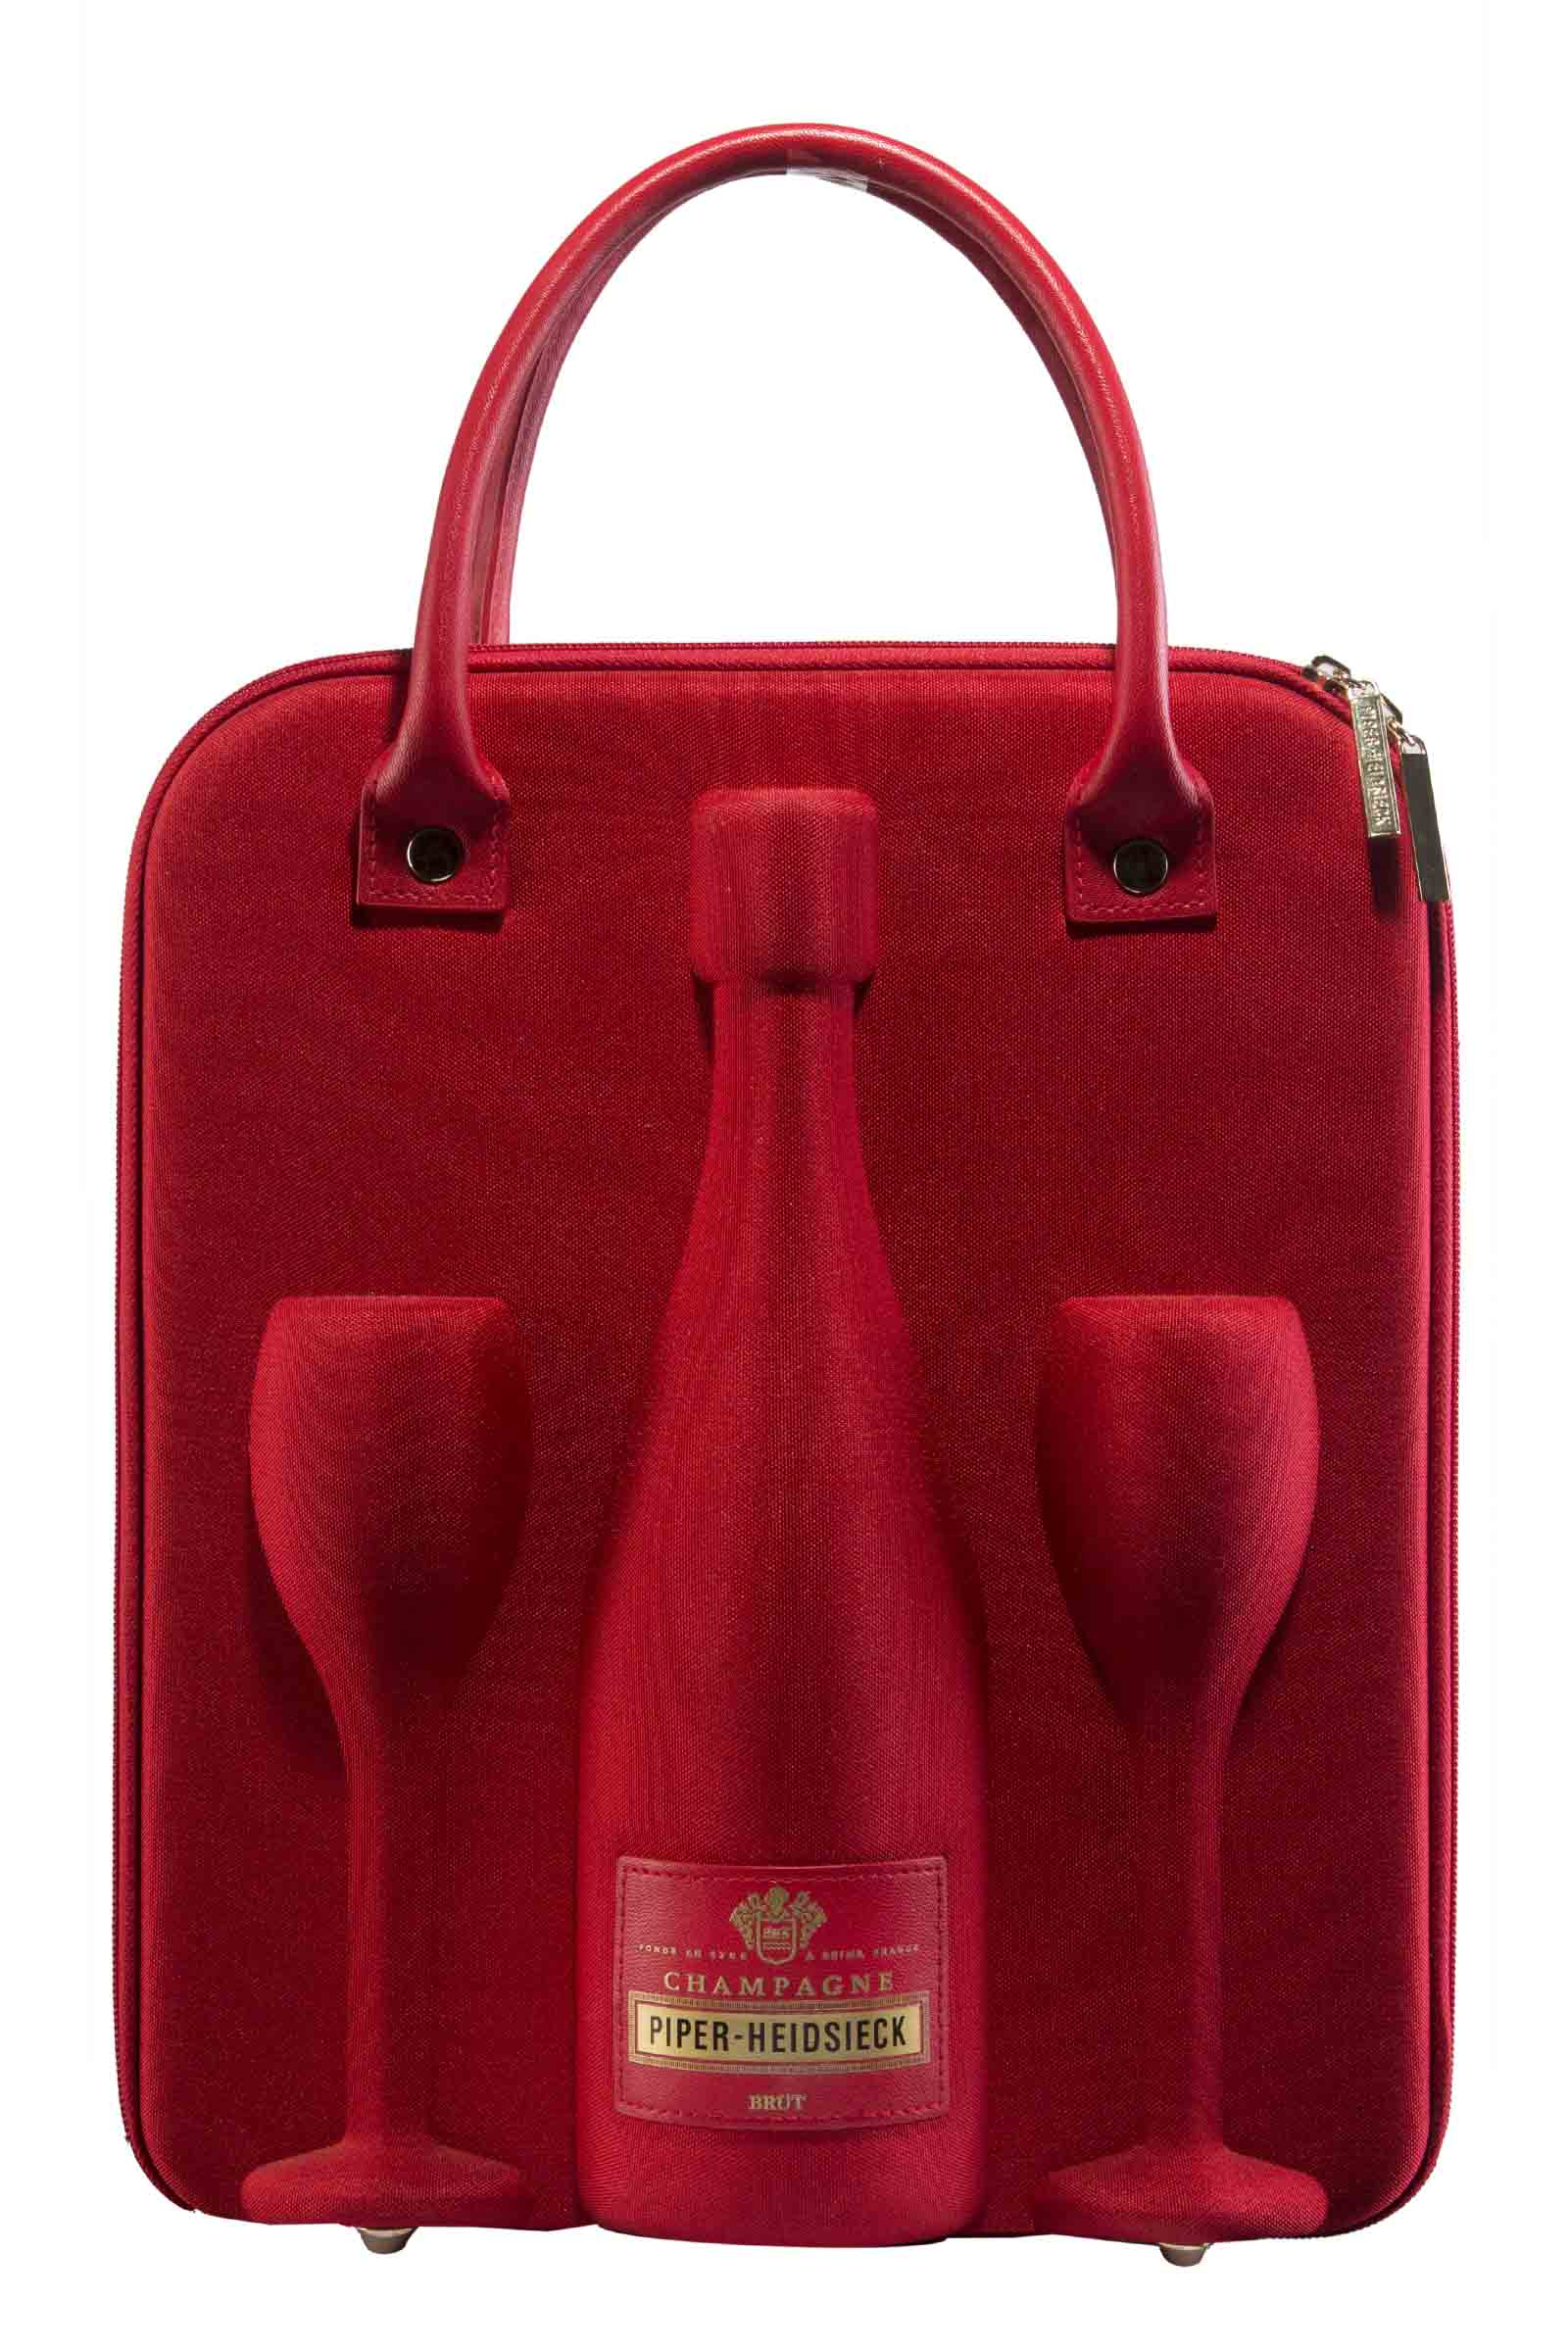 Gift Pack Champagne Piper Heidsieck Brut Travel Set 750ml